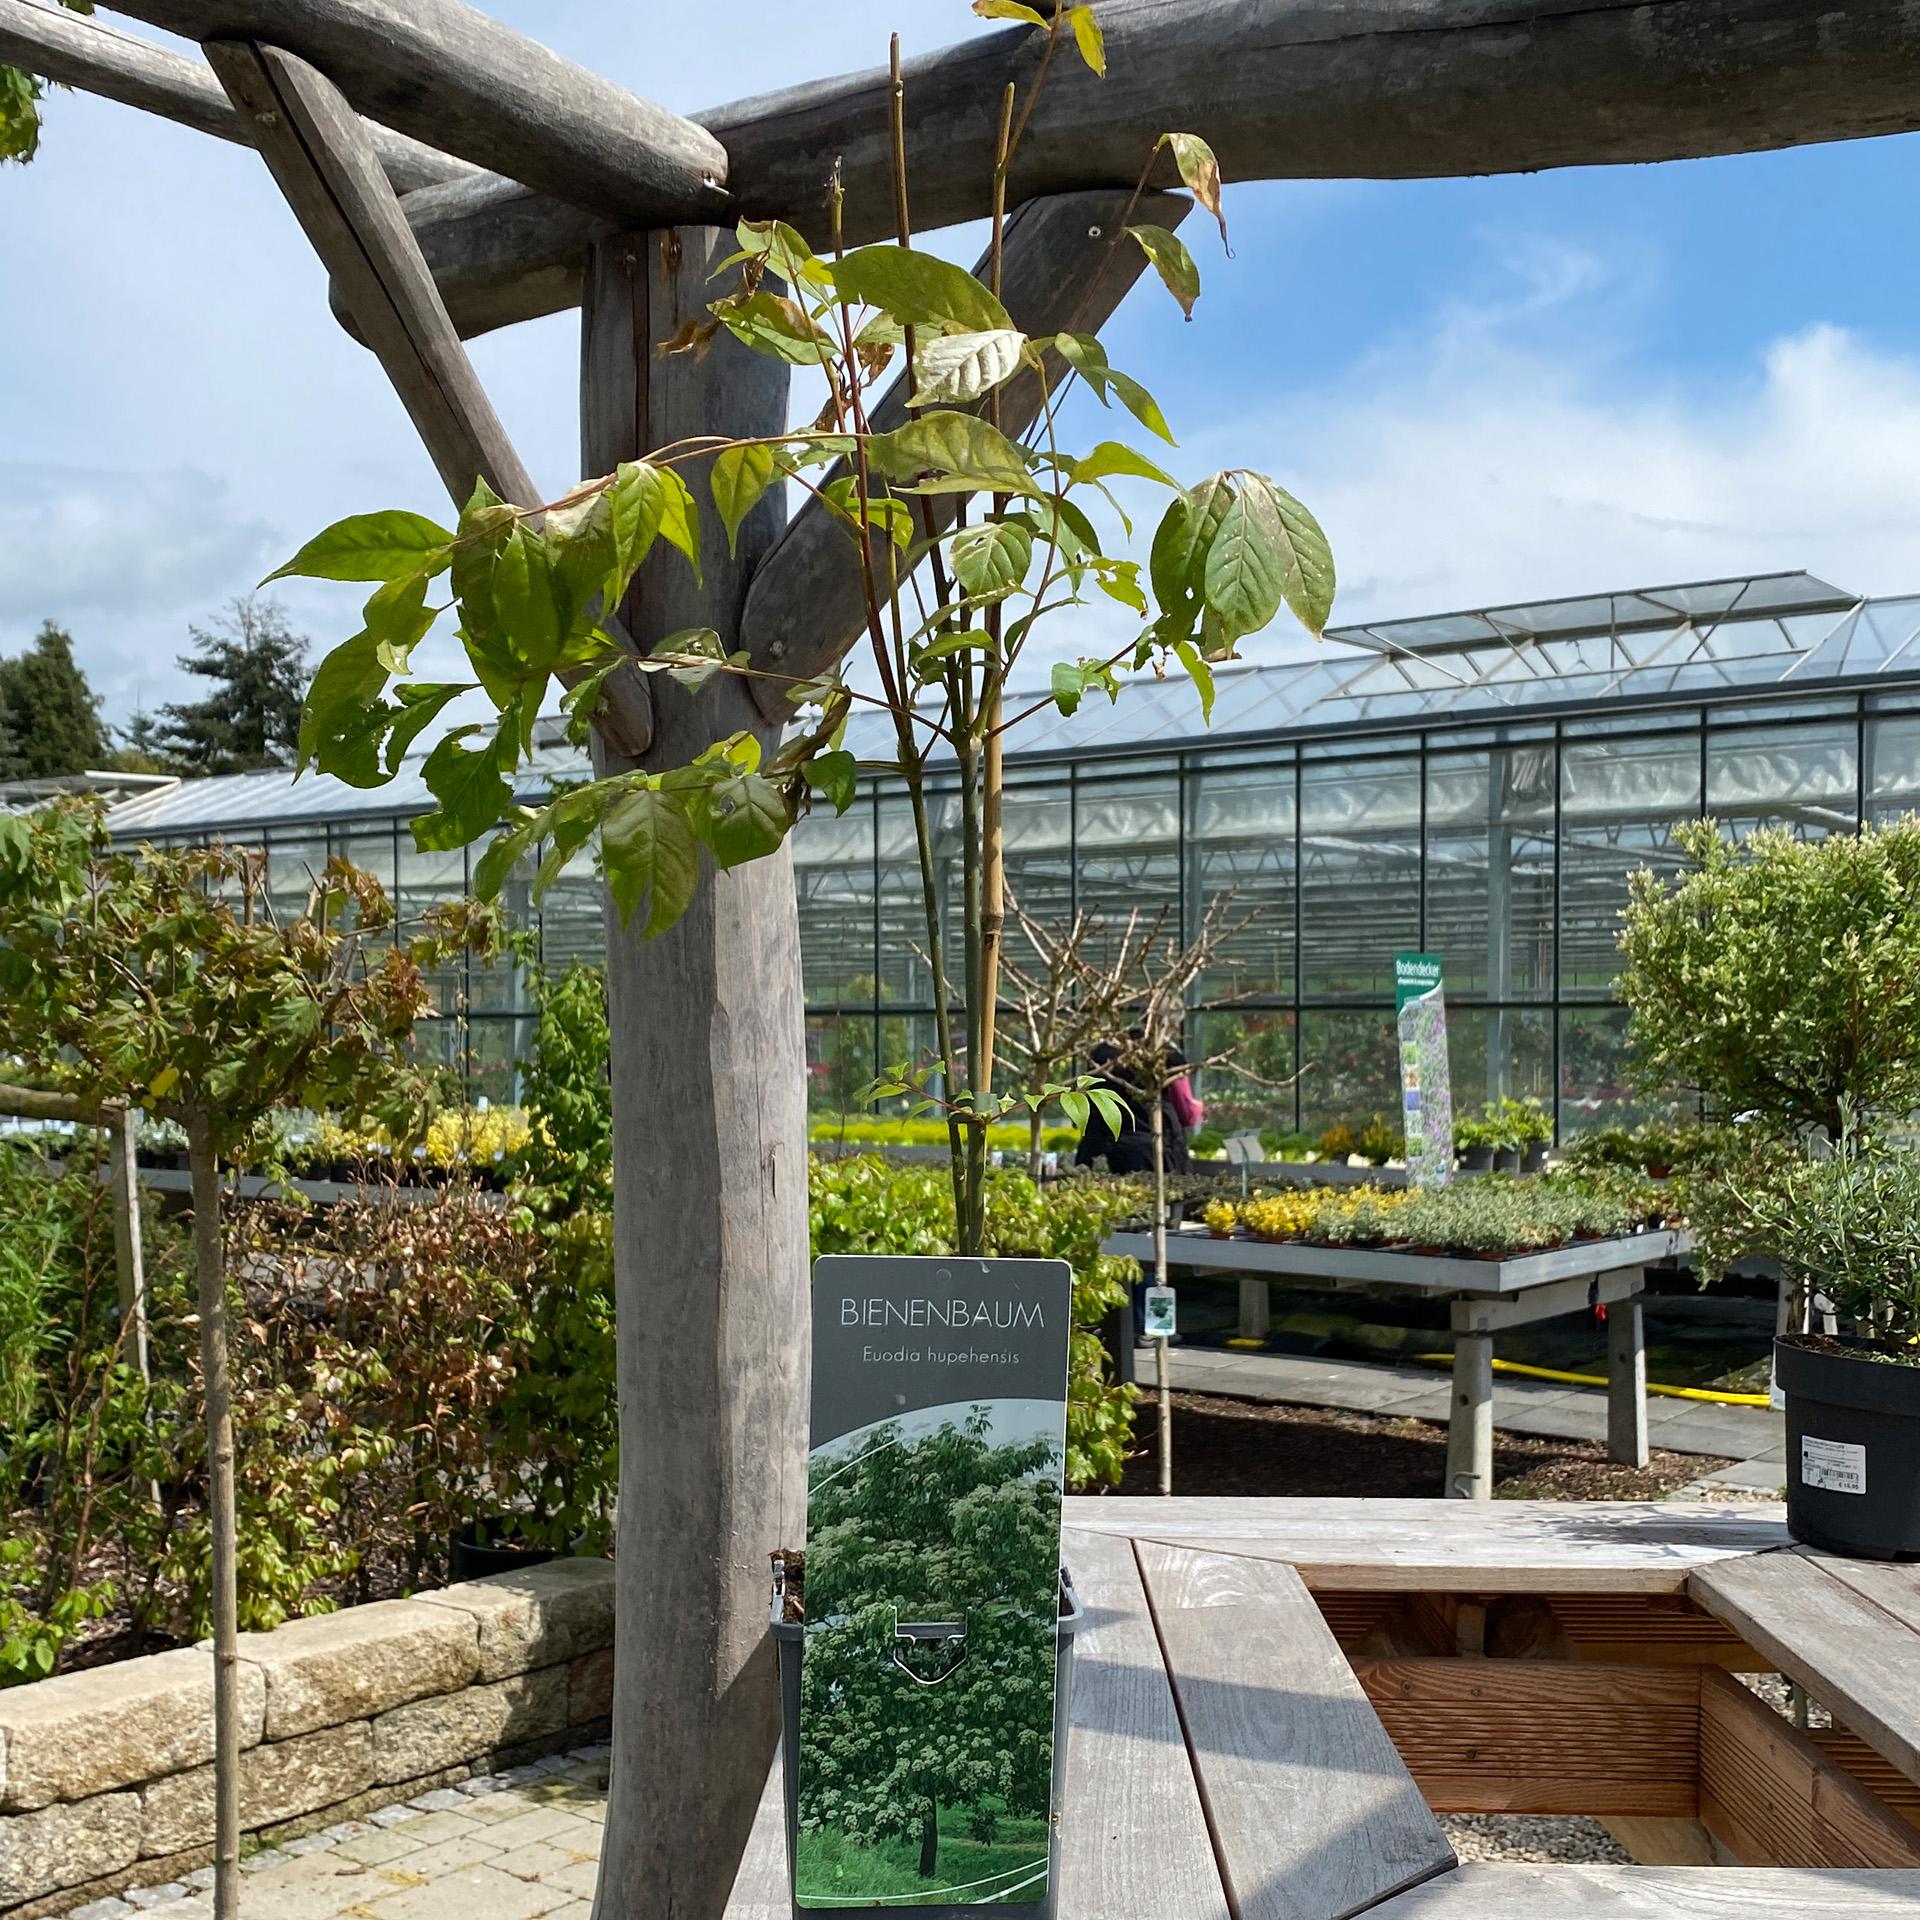 Bienenbaum – Euodia hupehensis, C2eck